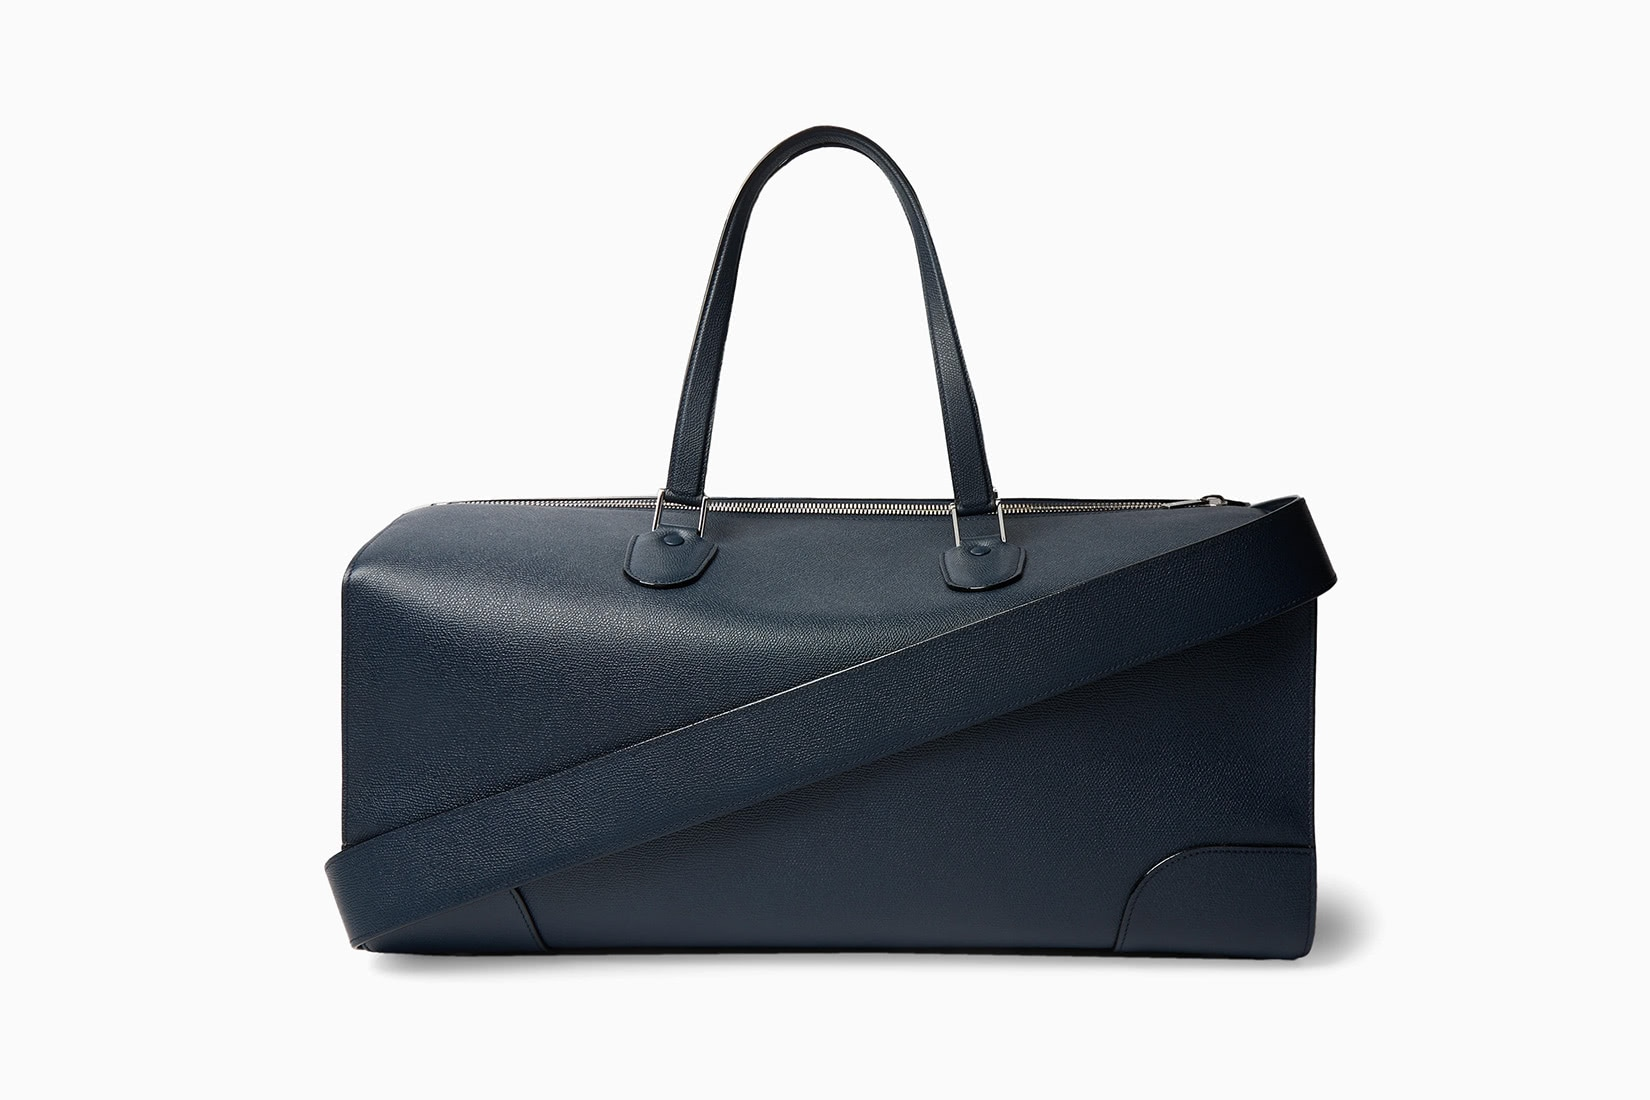 best duffel bags expensive valextra - Luxe Digital